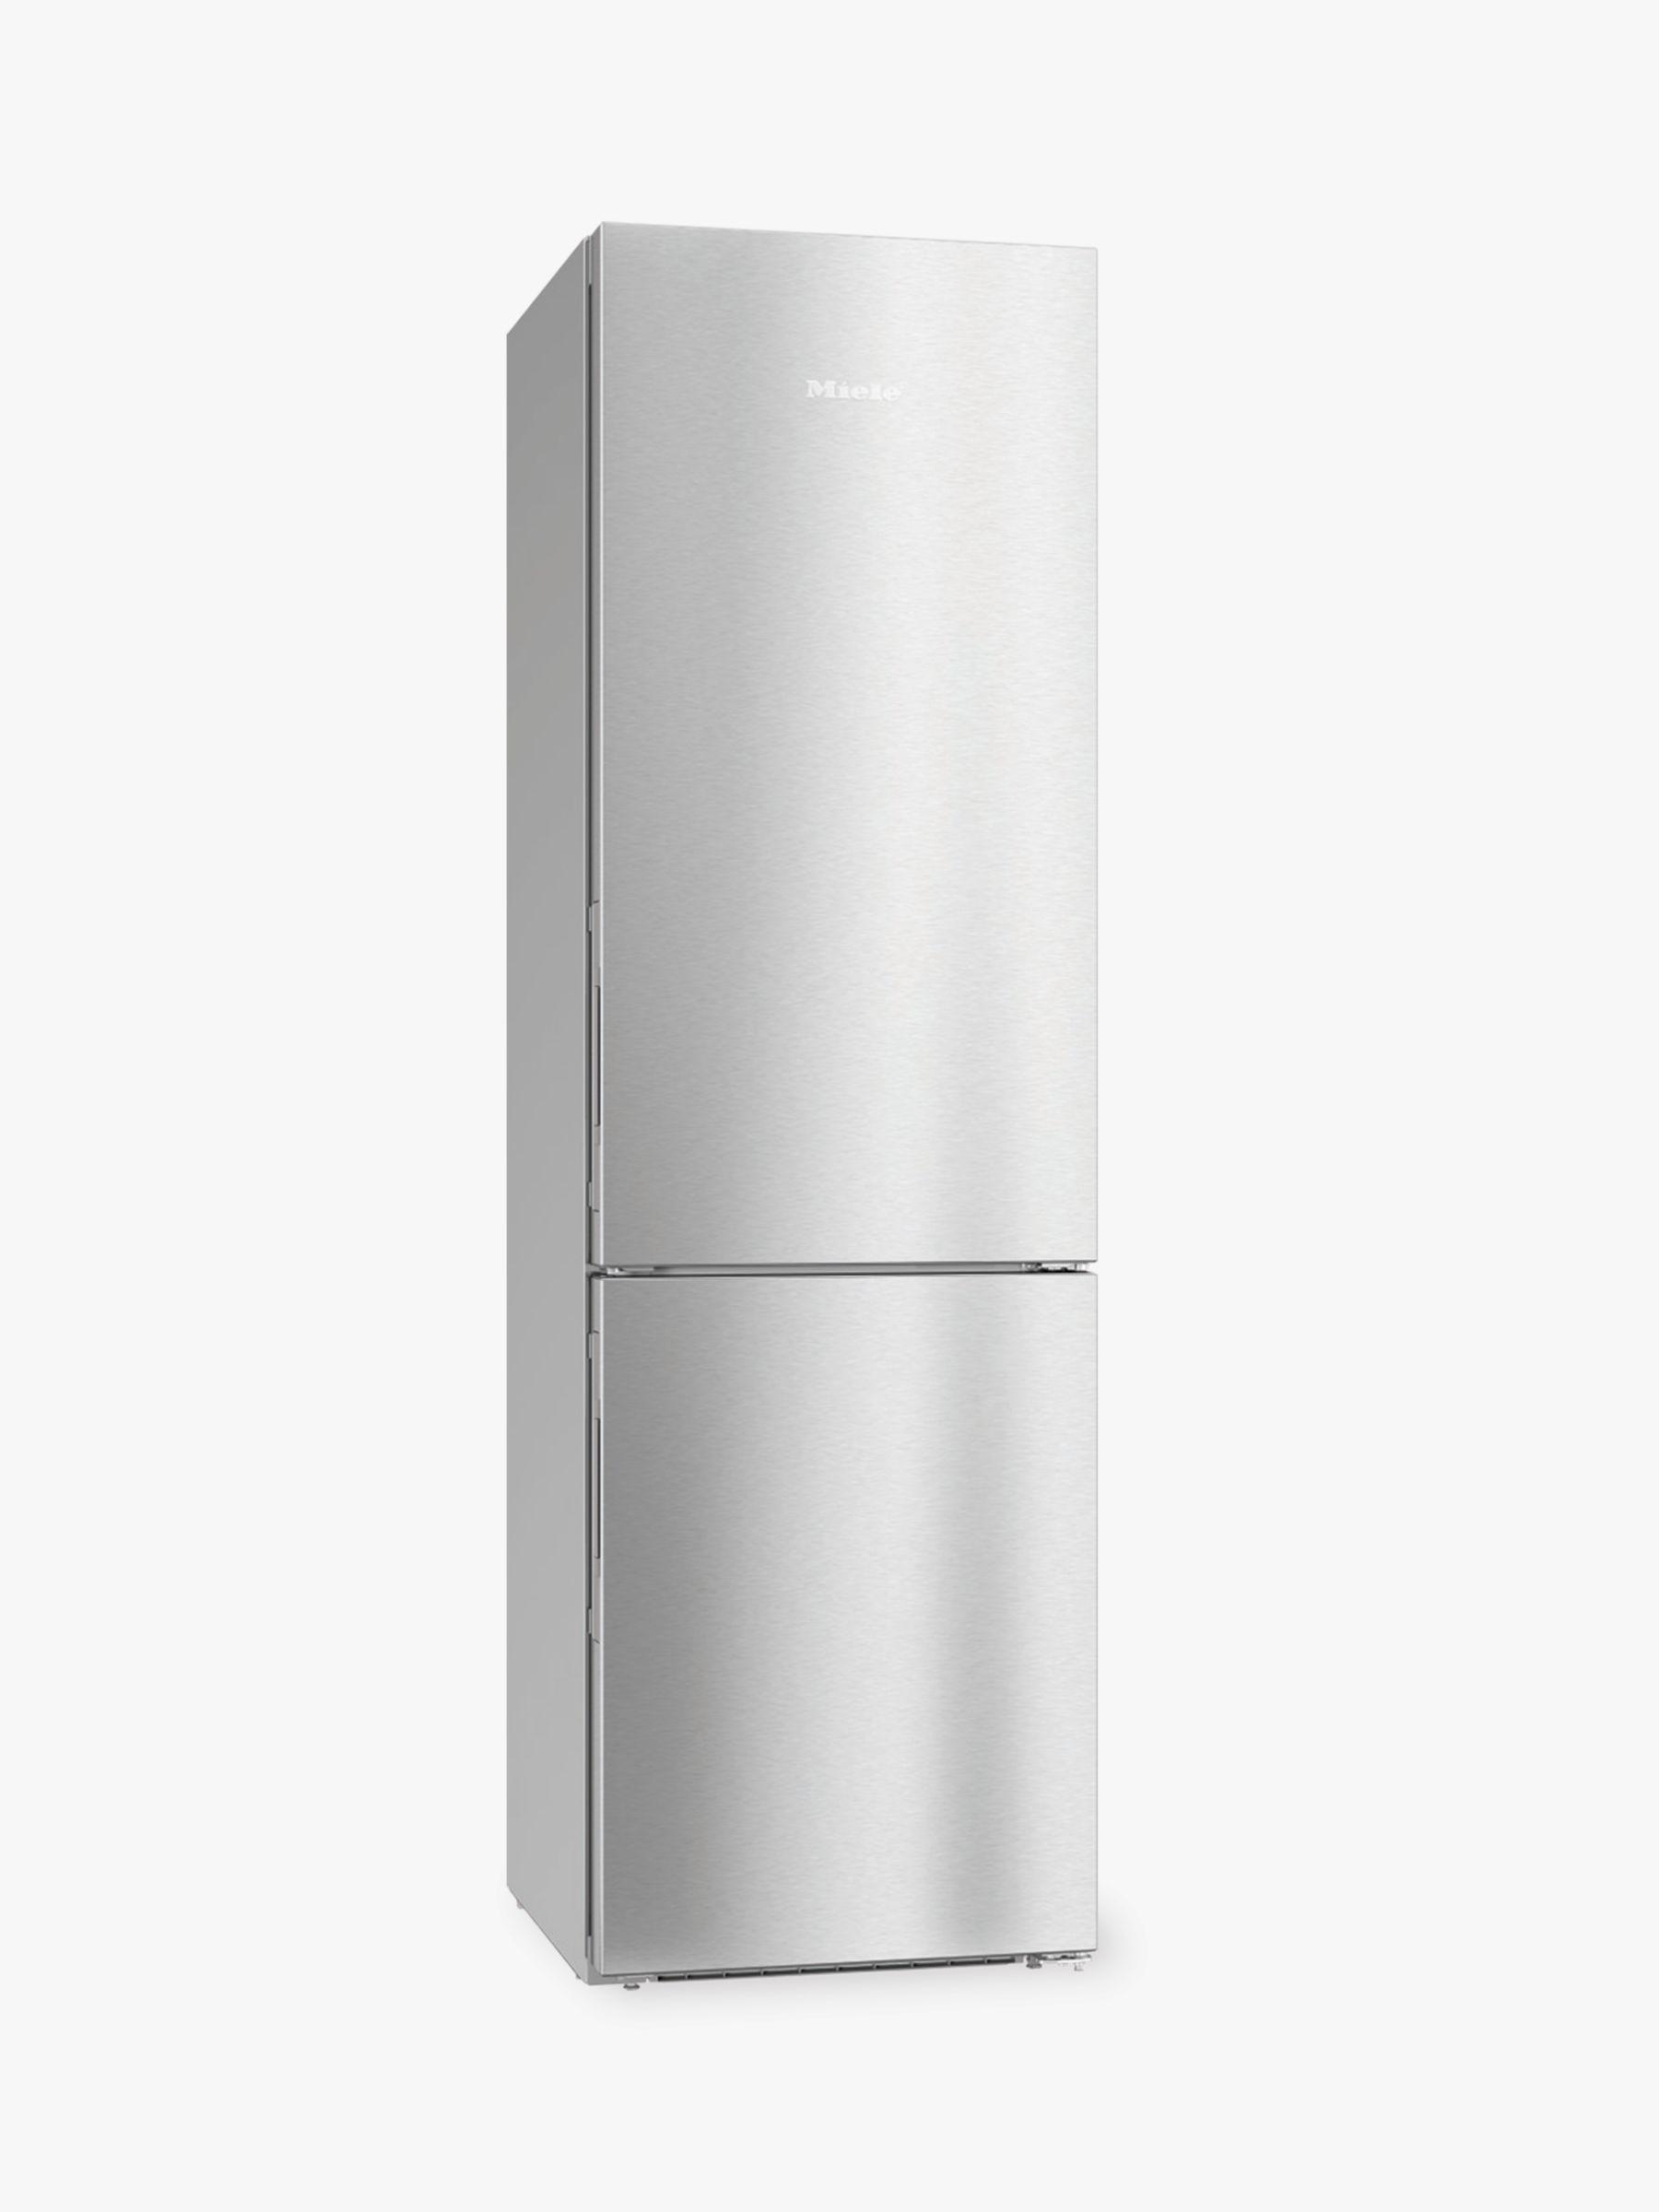 Miele Miele KFN 29233D Freestanding Fridge Freezer, 60cm Wide, A+++ Energy Rating, Stainless Steel